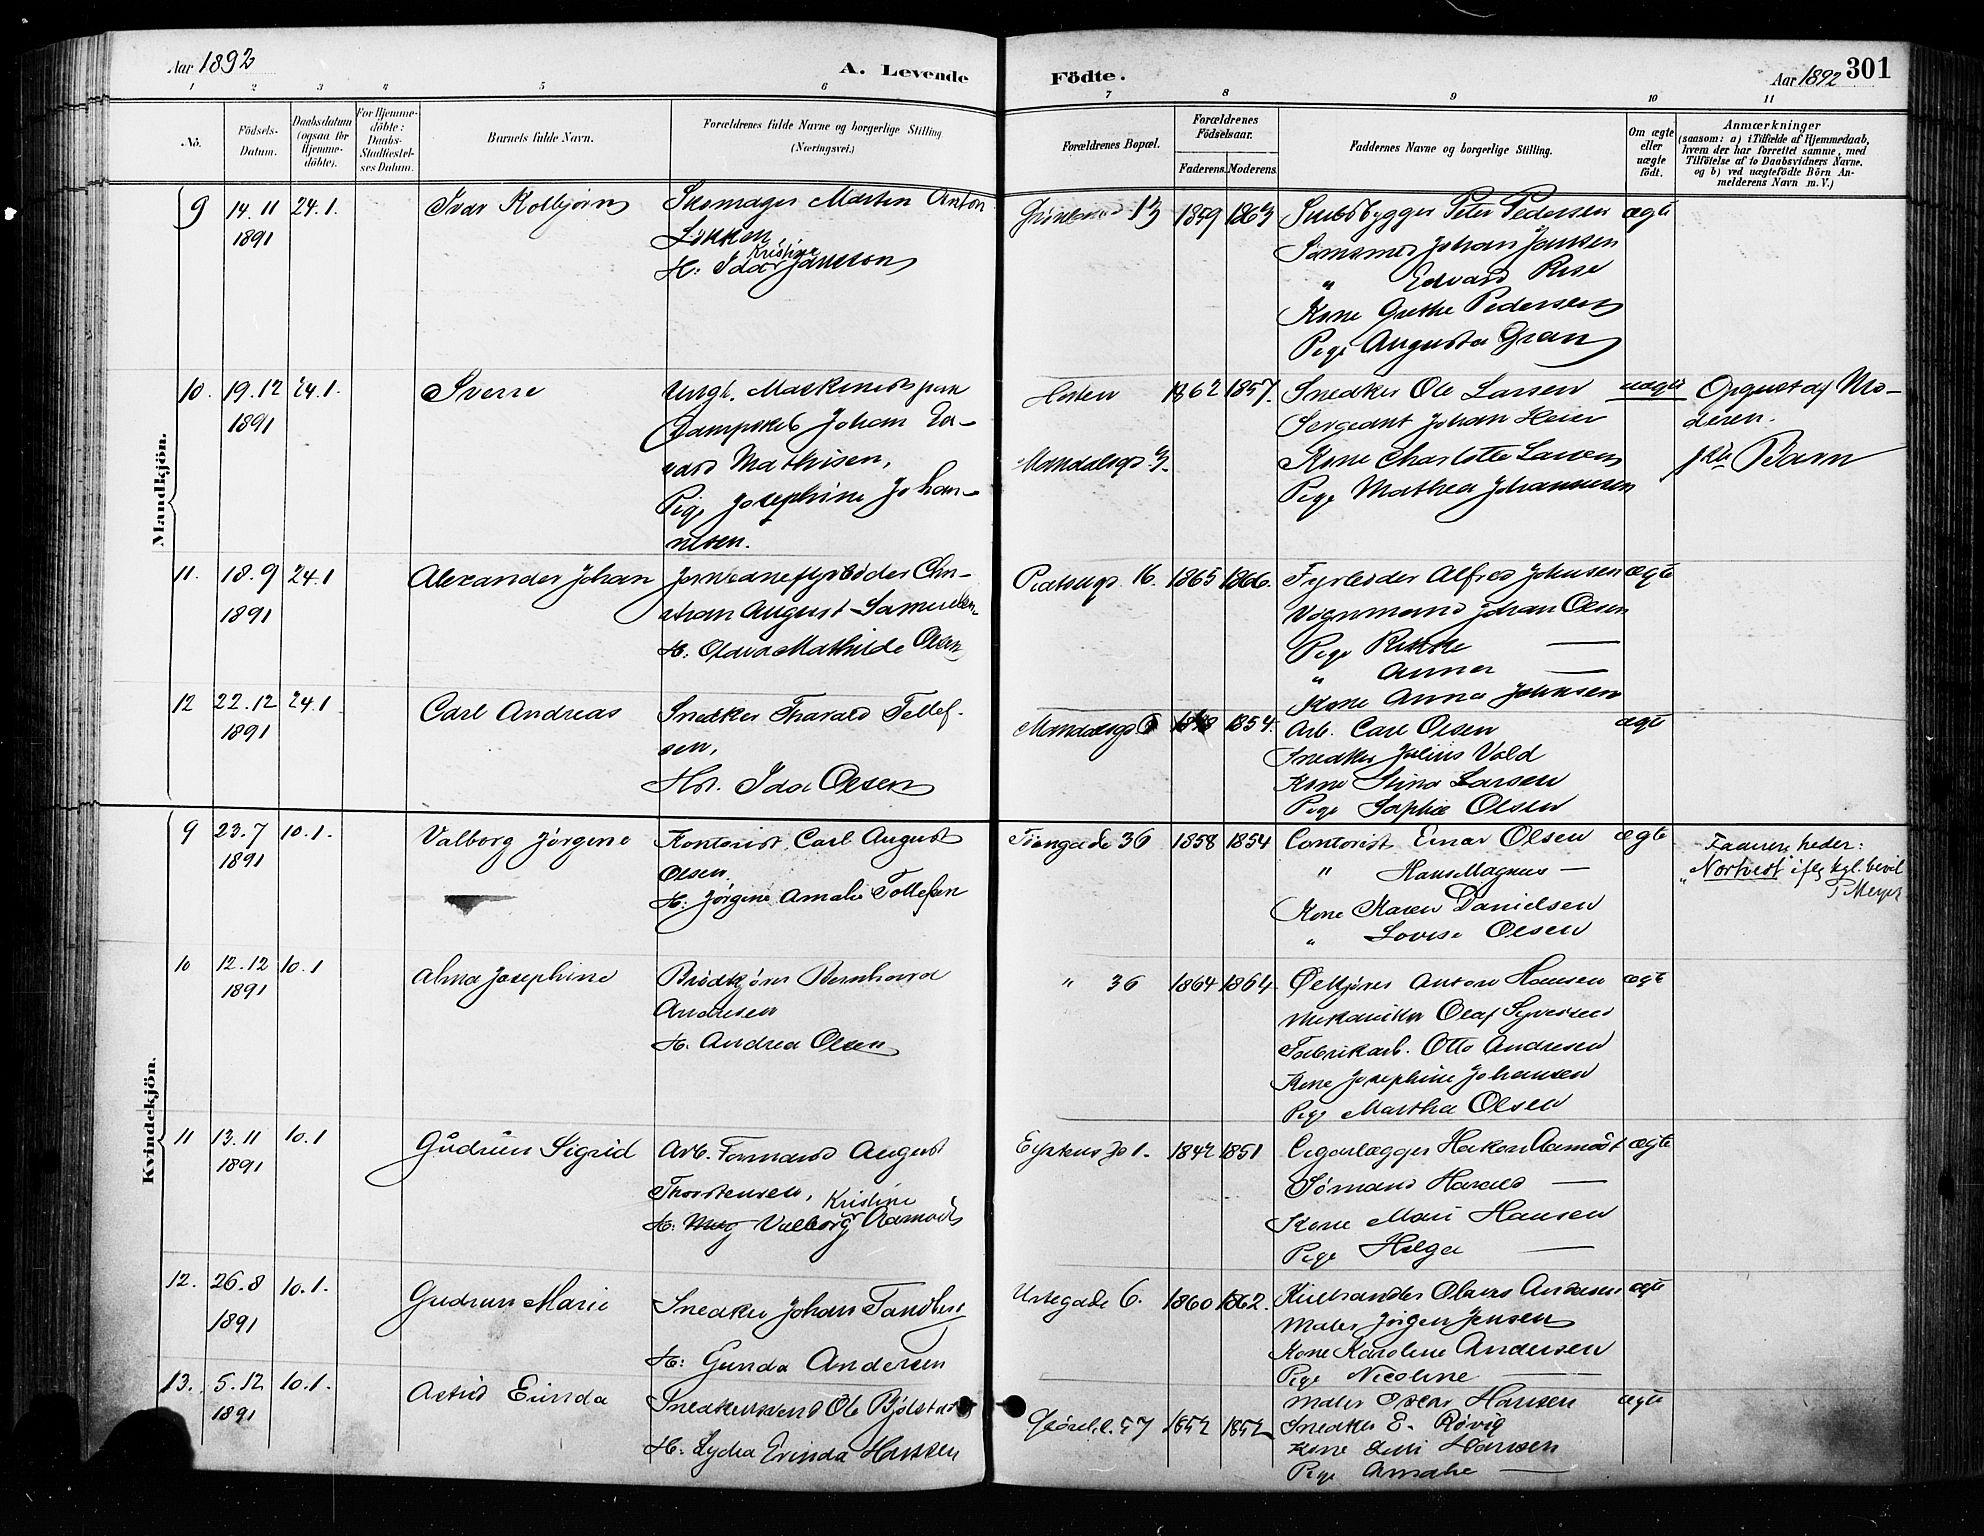 SAO, Grønland prestekontor Kirkebøker, F/Fa/L0009: Ministerialbok nr. 9, 1888-1893, s. 301